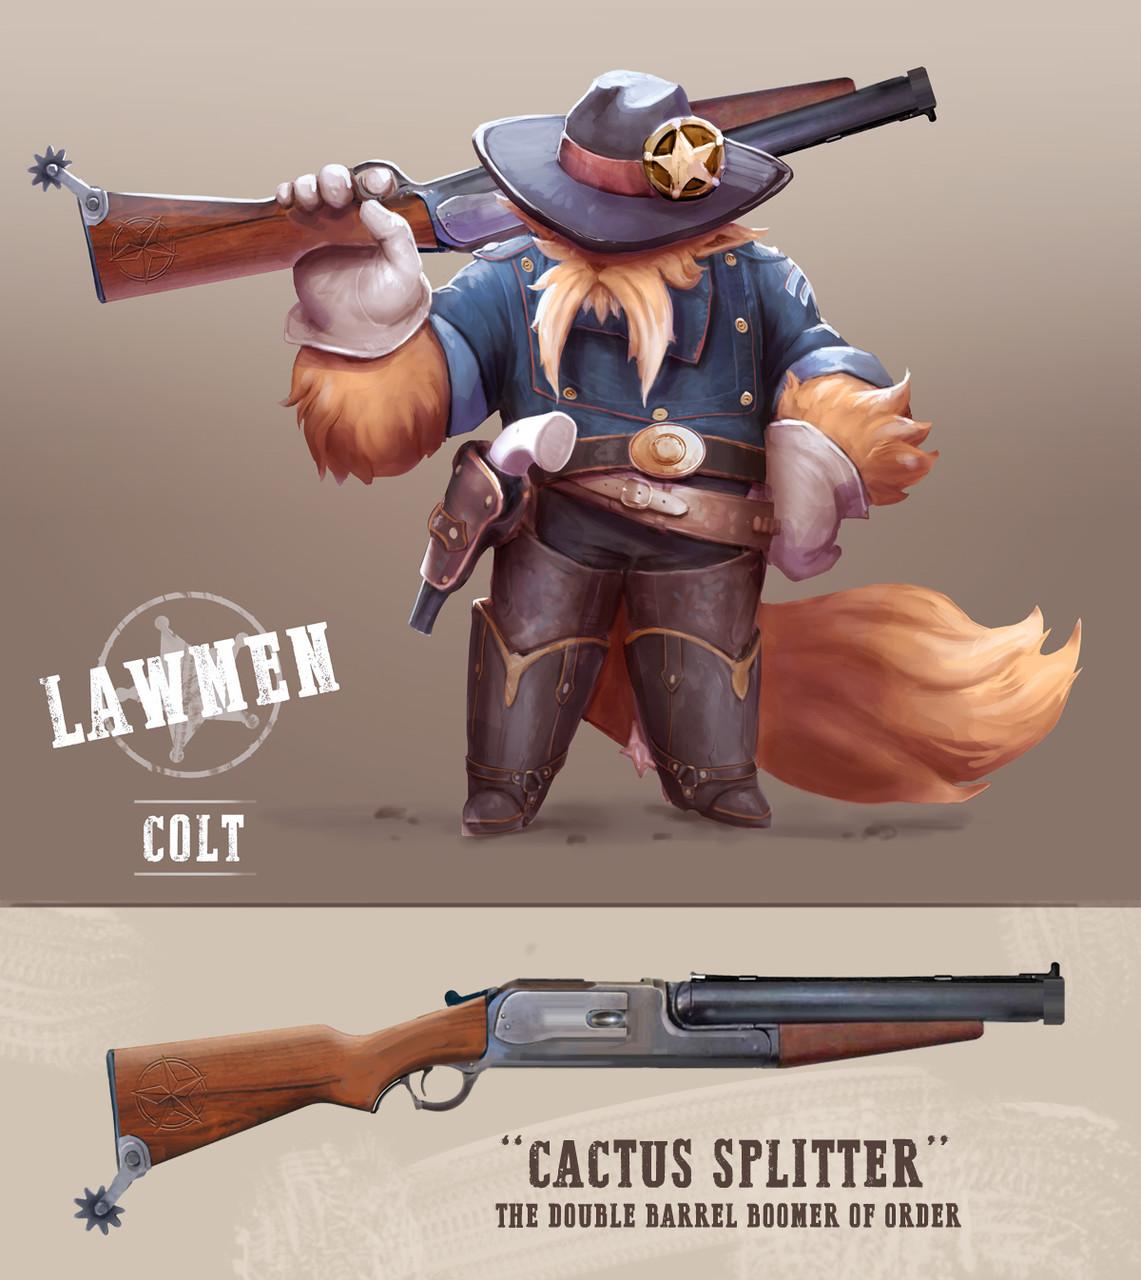 Colt Concept Art